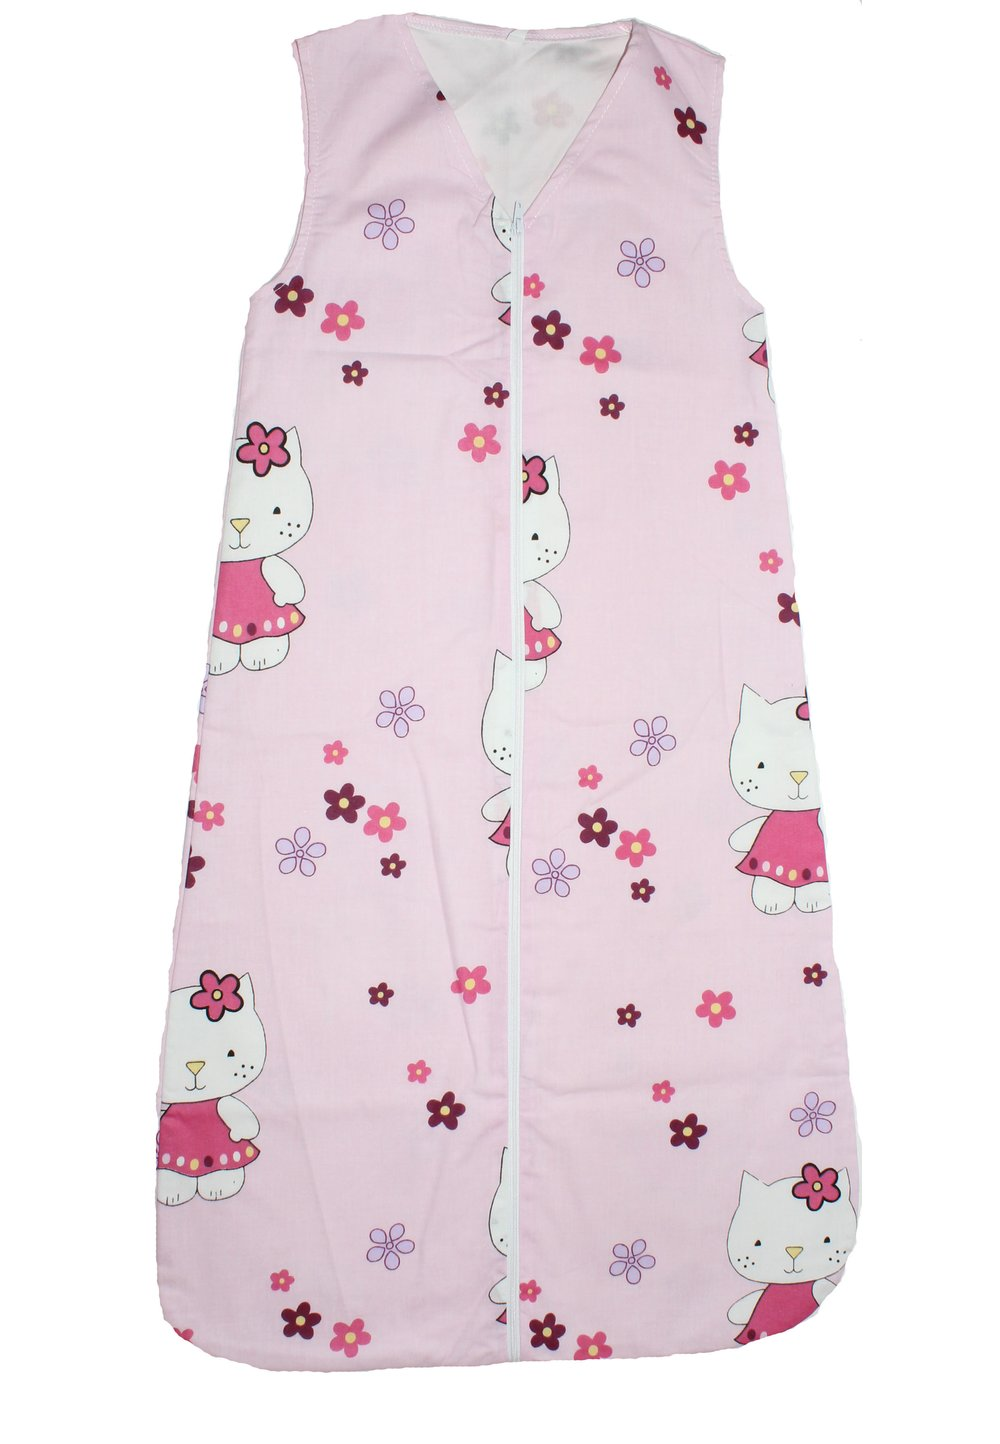 Sac de dormit, vara, kitty, roz imagine